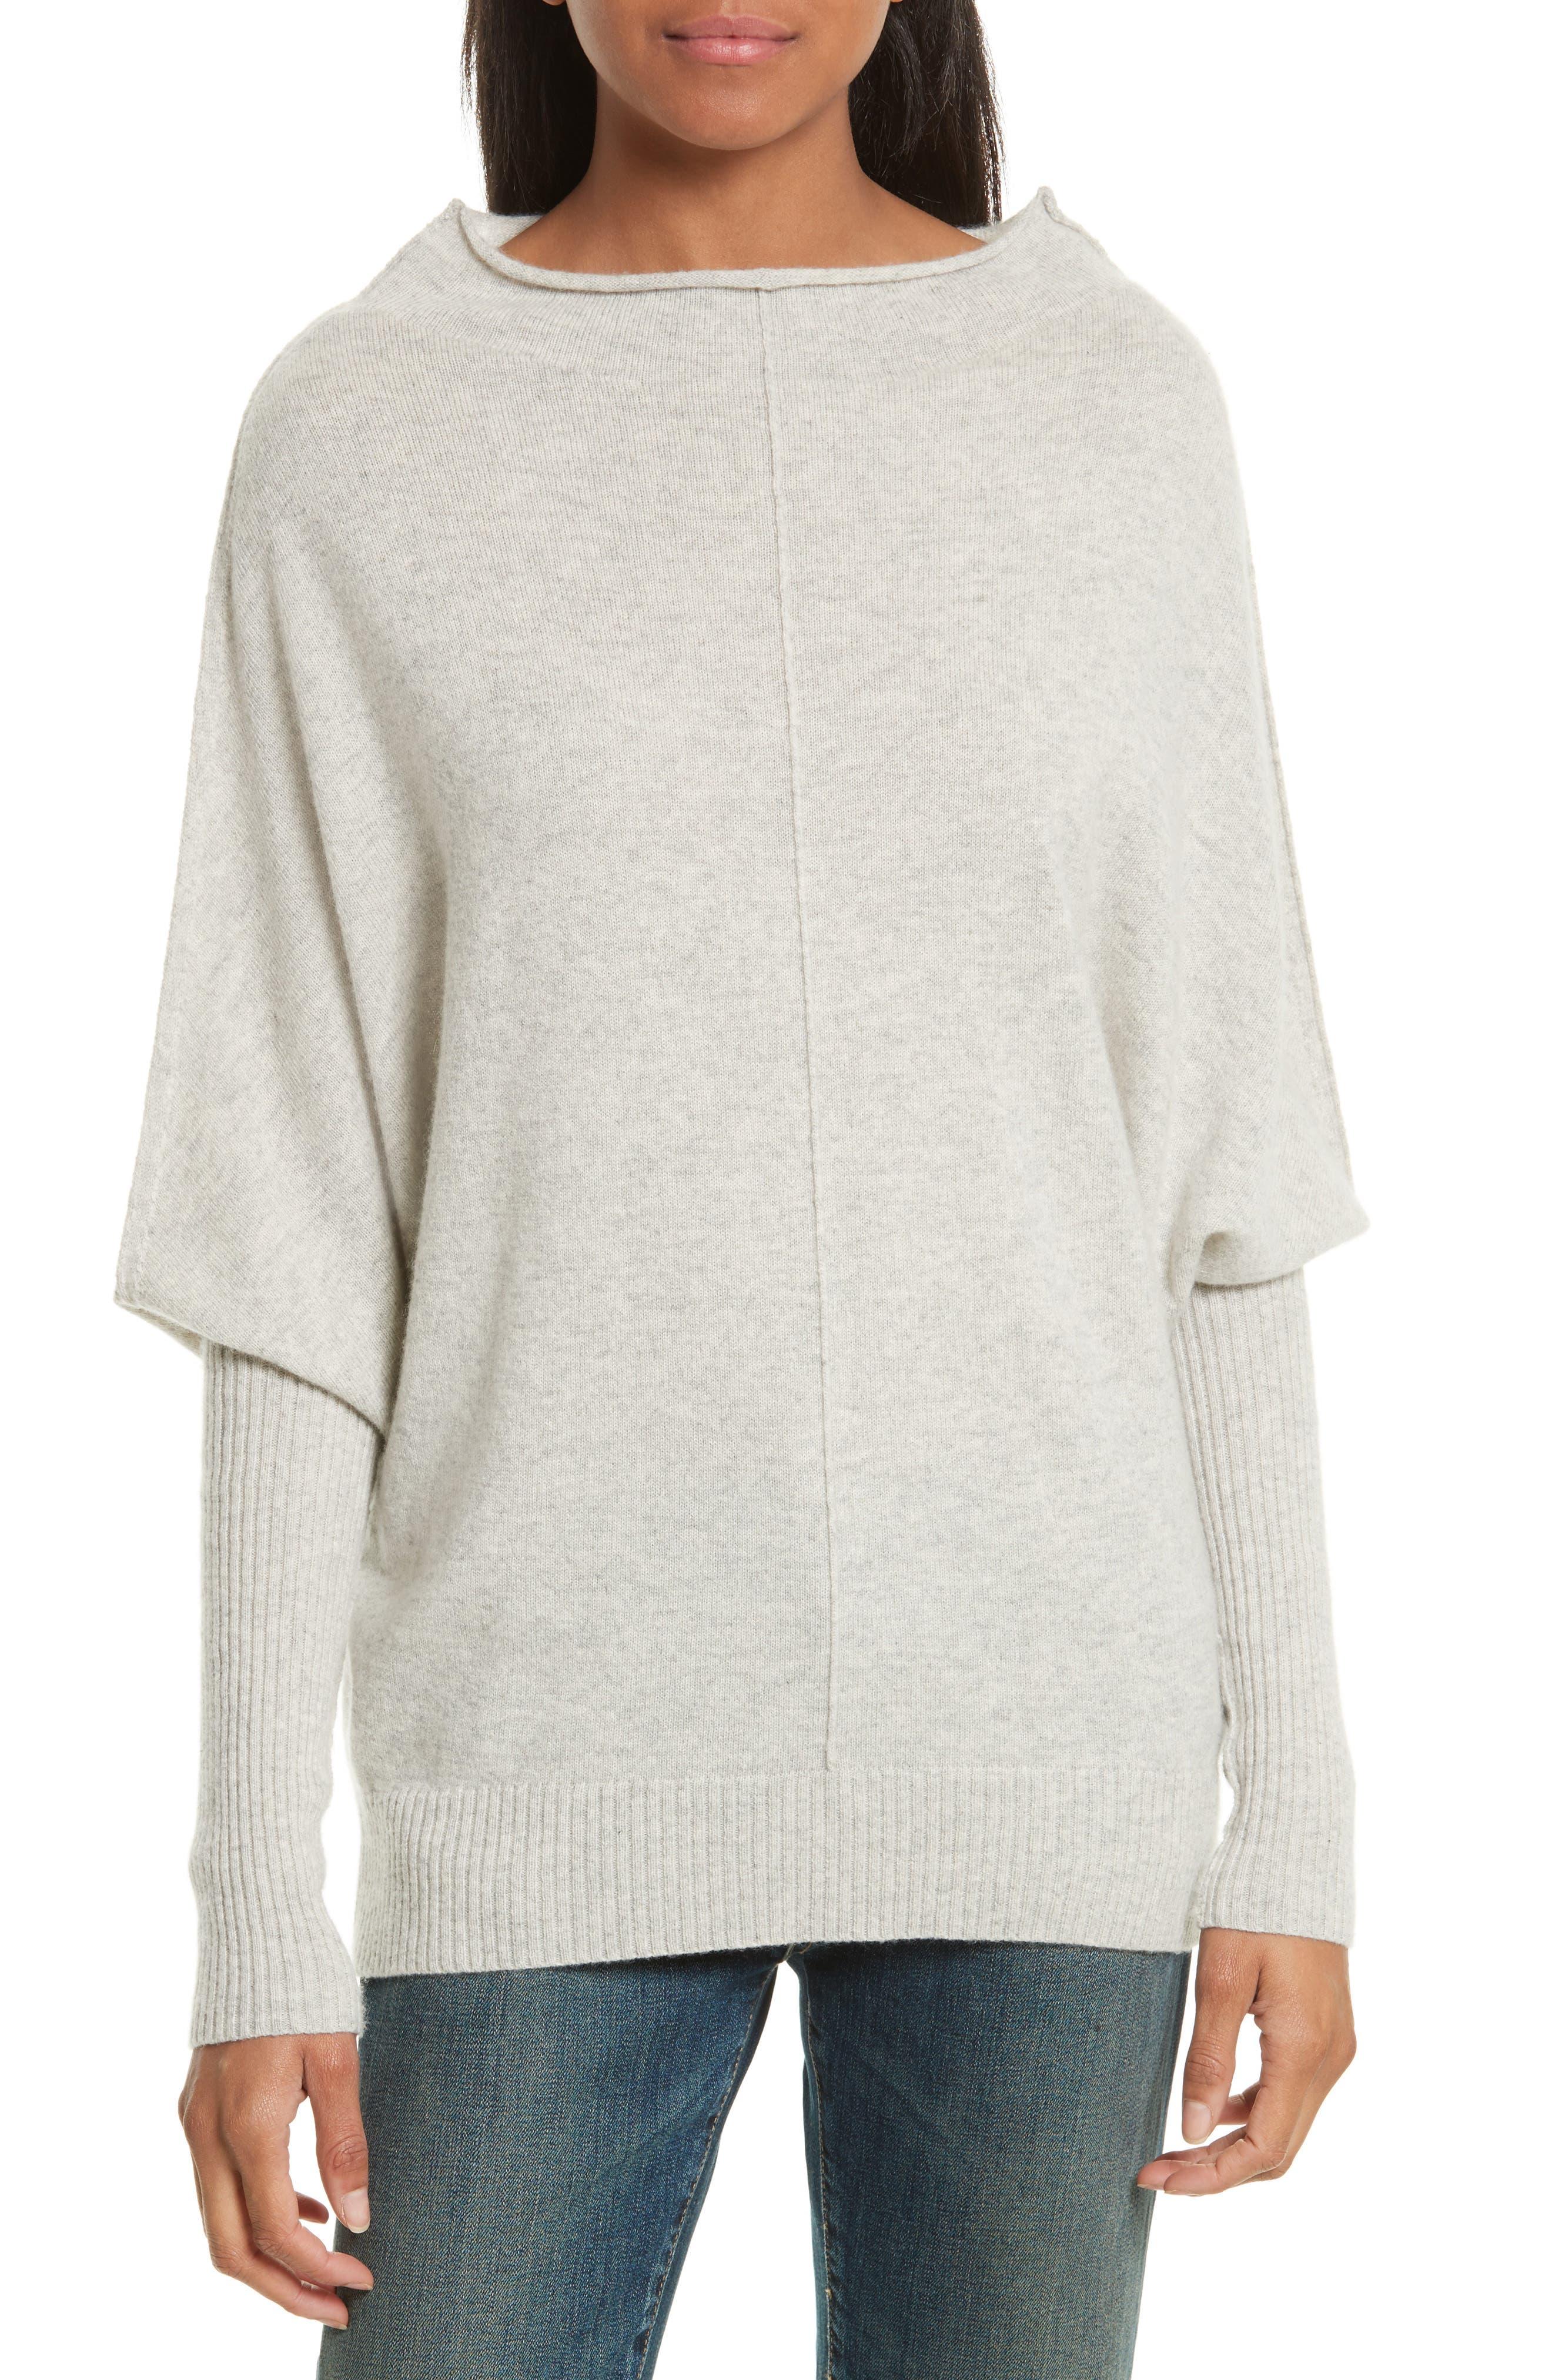 Alternate Image 1 Selected - Nili Lotan Rosalie Cashmere Sweater